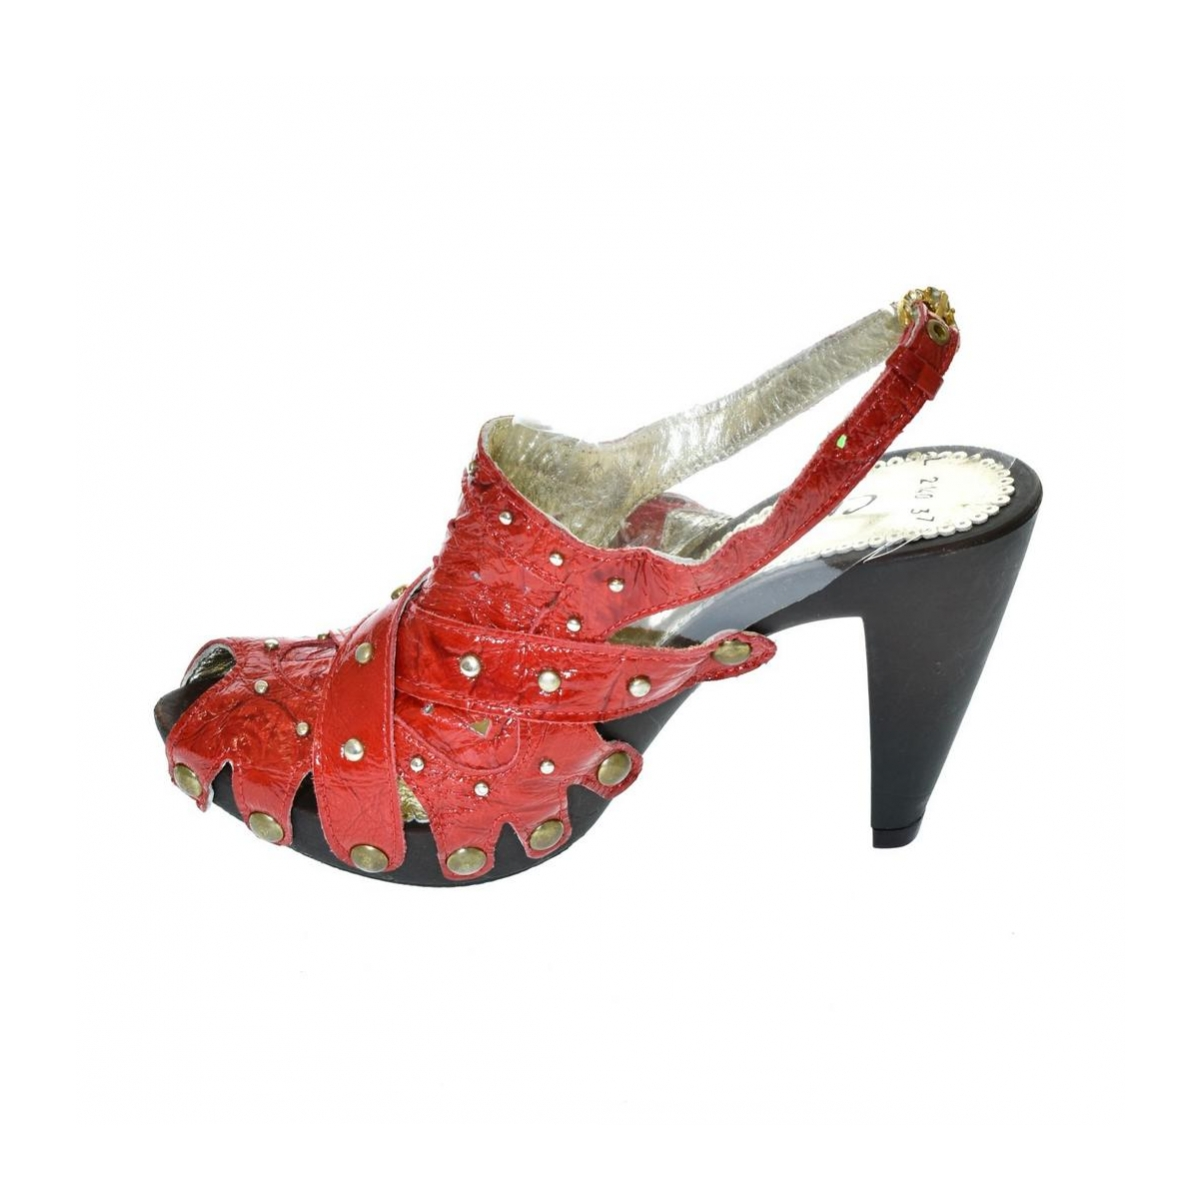 9d72fe5278bf Dámske červené sandále RESS - 4